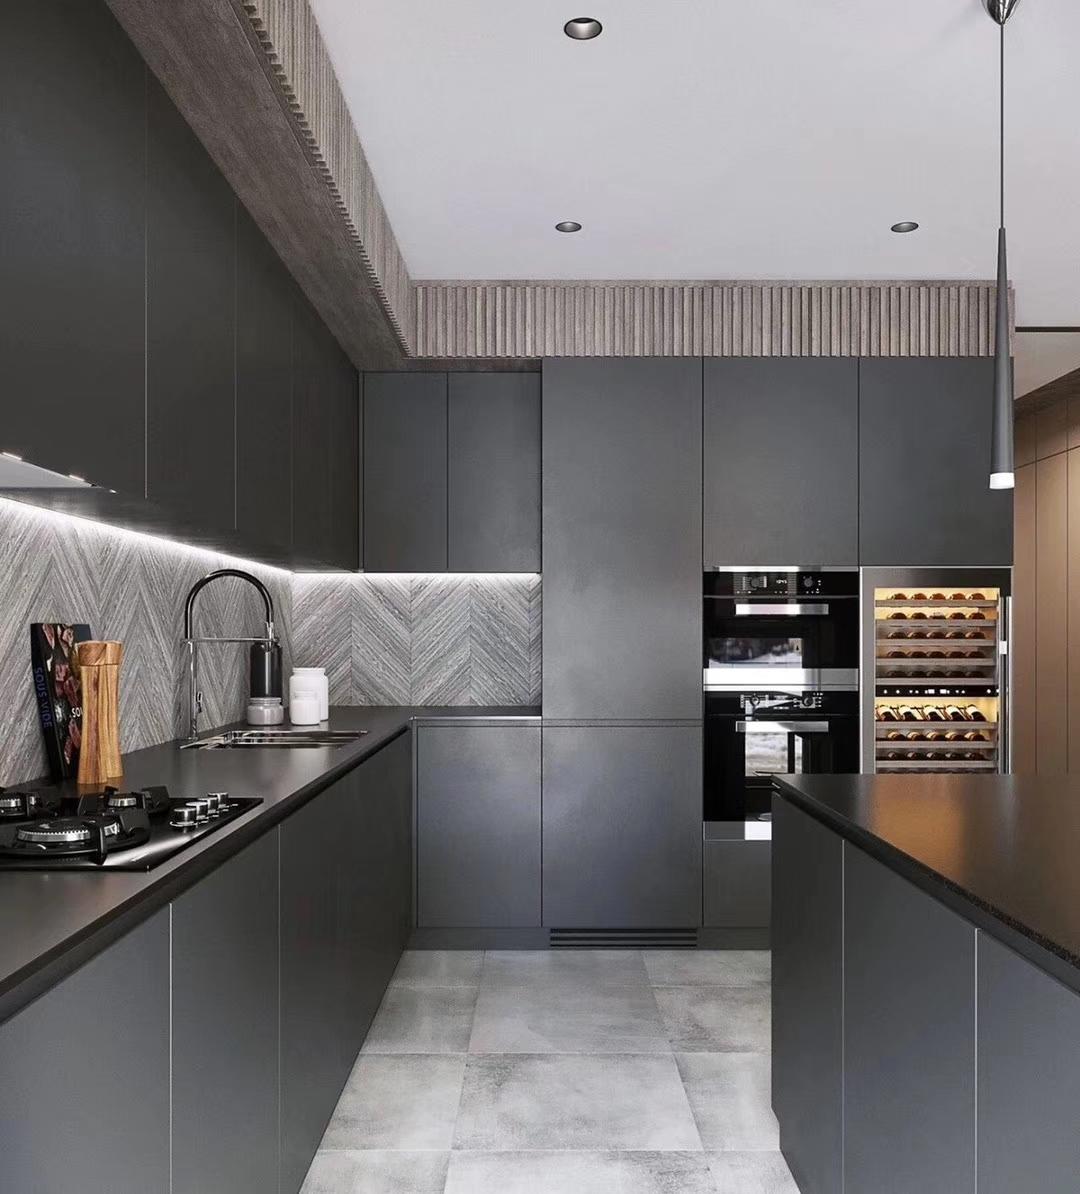 Modular Black Melamine Kitchen Cabinets Modern Picture Australia Standard Buy Modern Kitchen Cabinets Picture Modular Kitchen Cabinets Modern Kitchen Cabinets Australia Standard Product On Alibaba Com